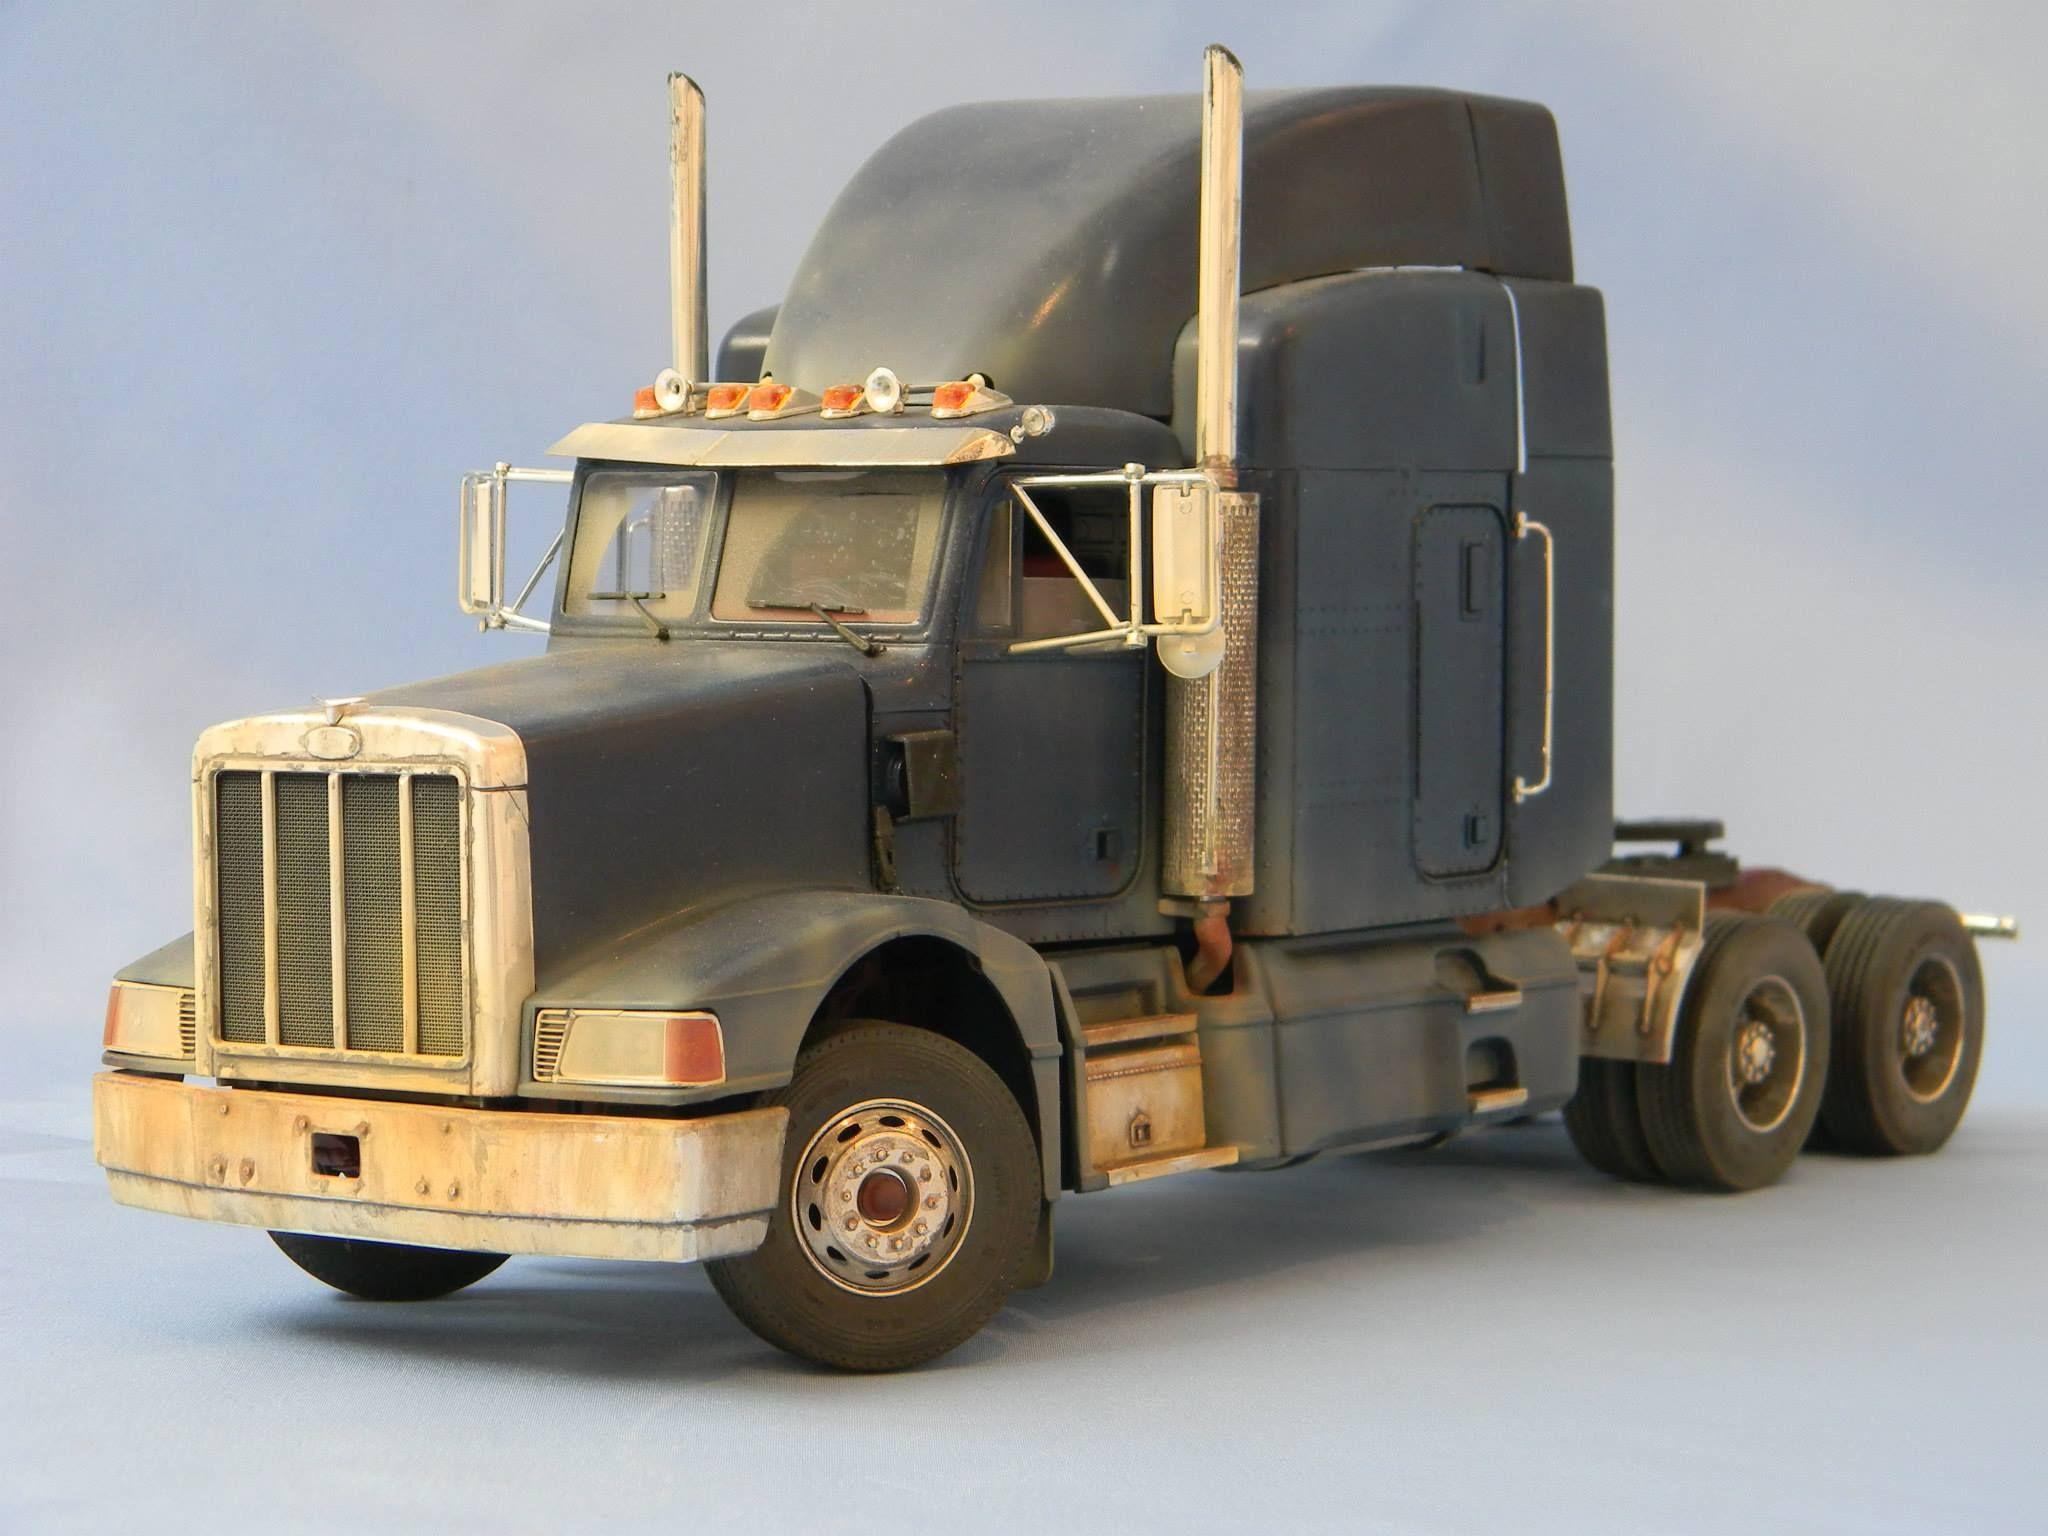 Peterbilt truck italeri 1 25 peterbilt trucksmodel kitsscale